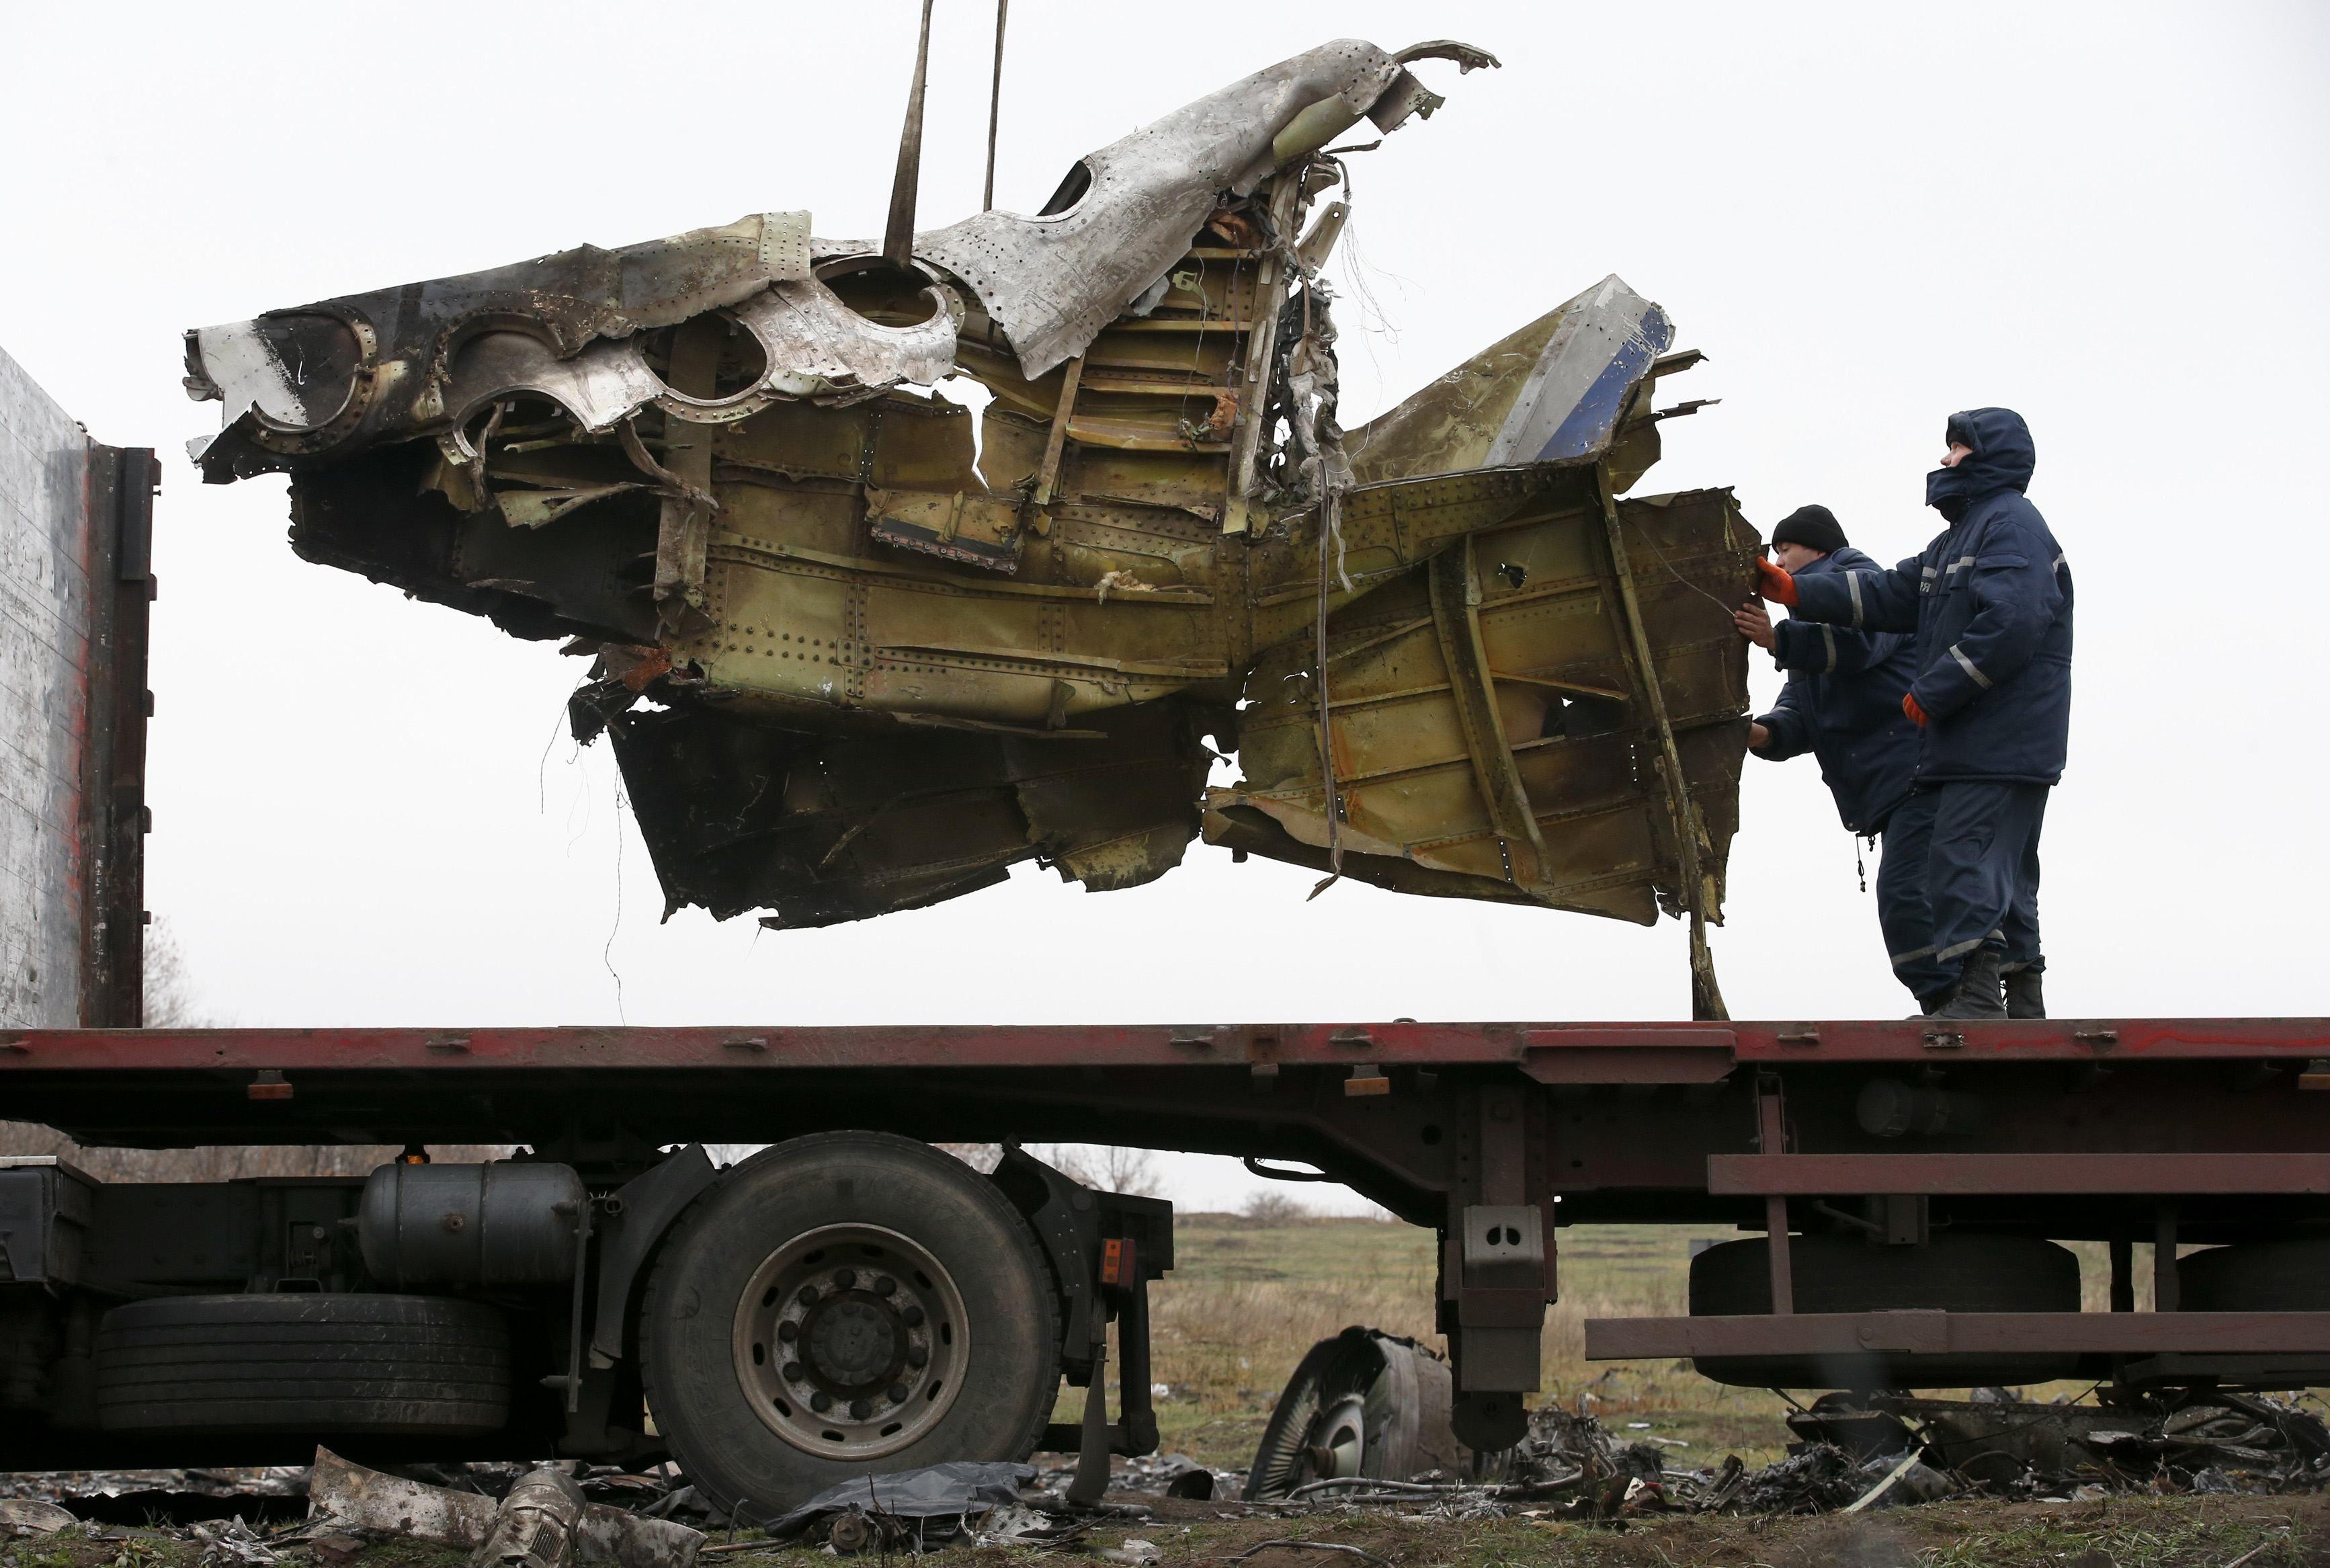 Обломки самолета, потерпевшего катастрофу на Донбассе